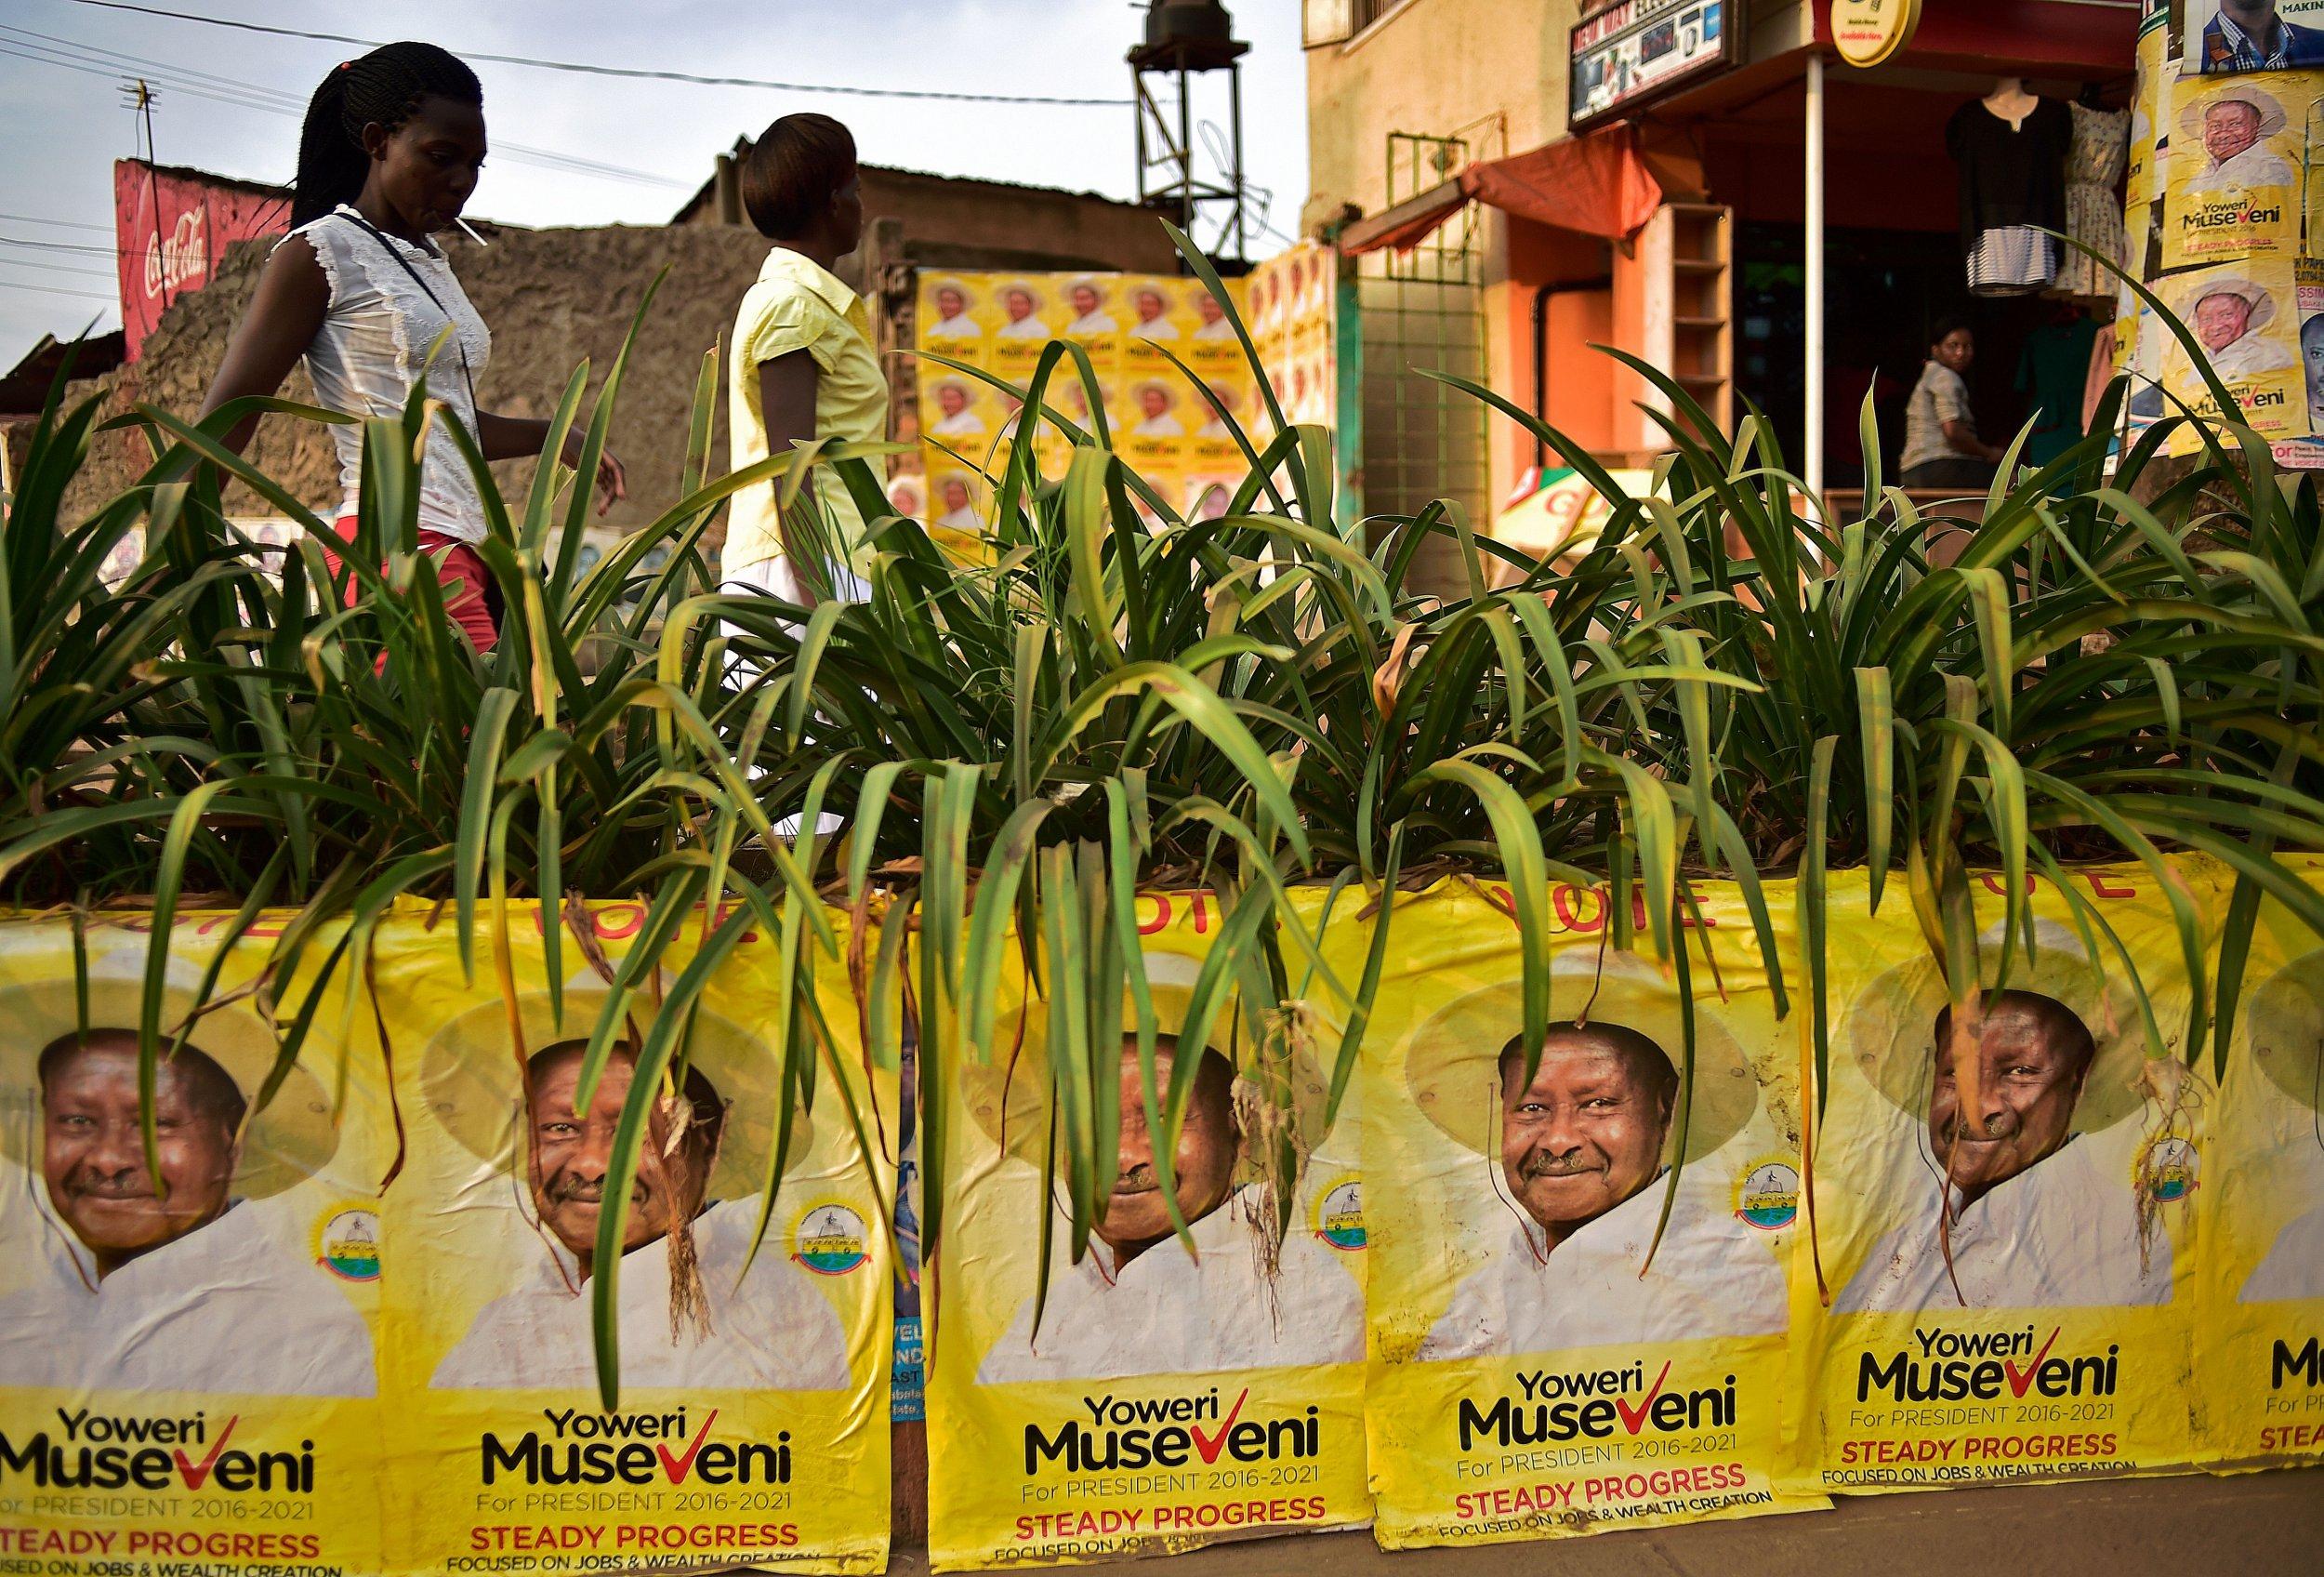 Yoweri Museveni campaign posters.